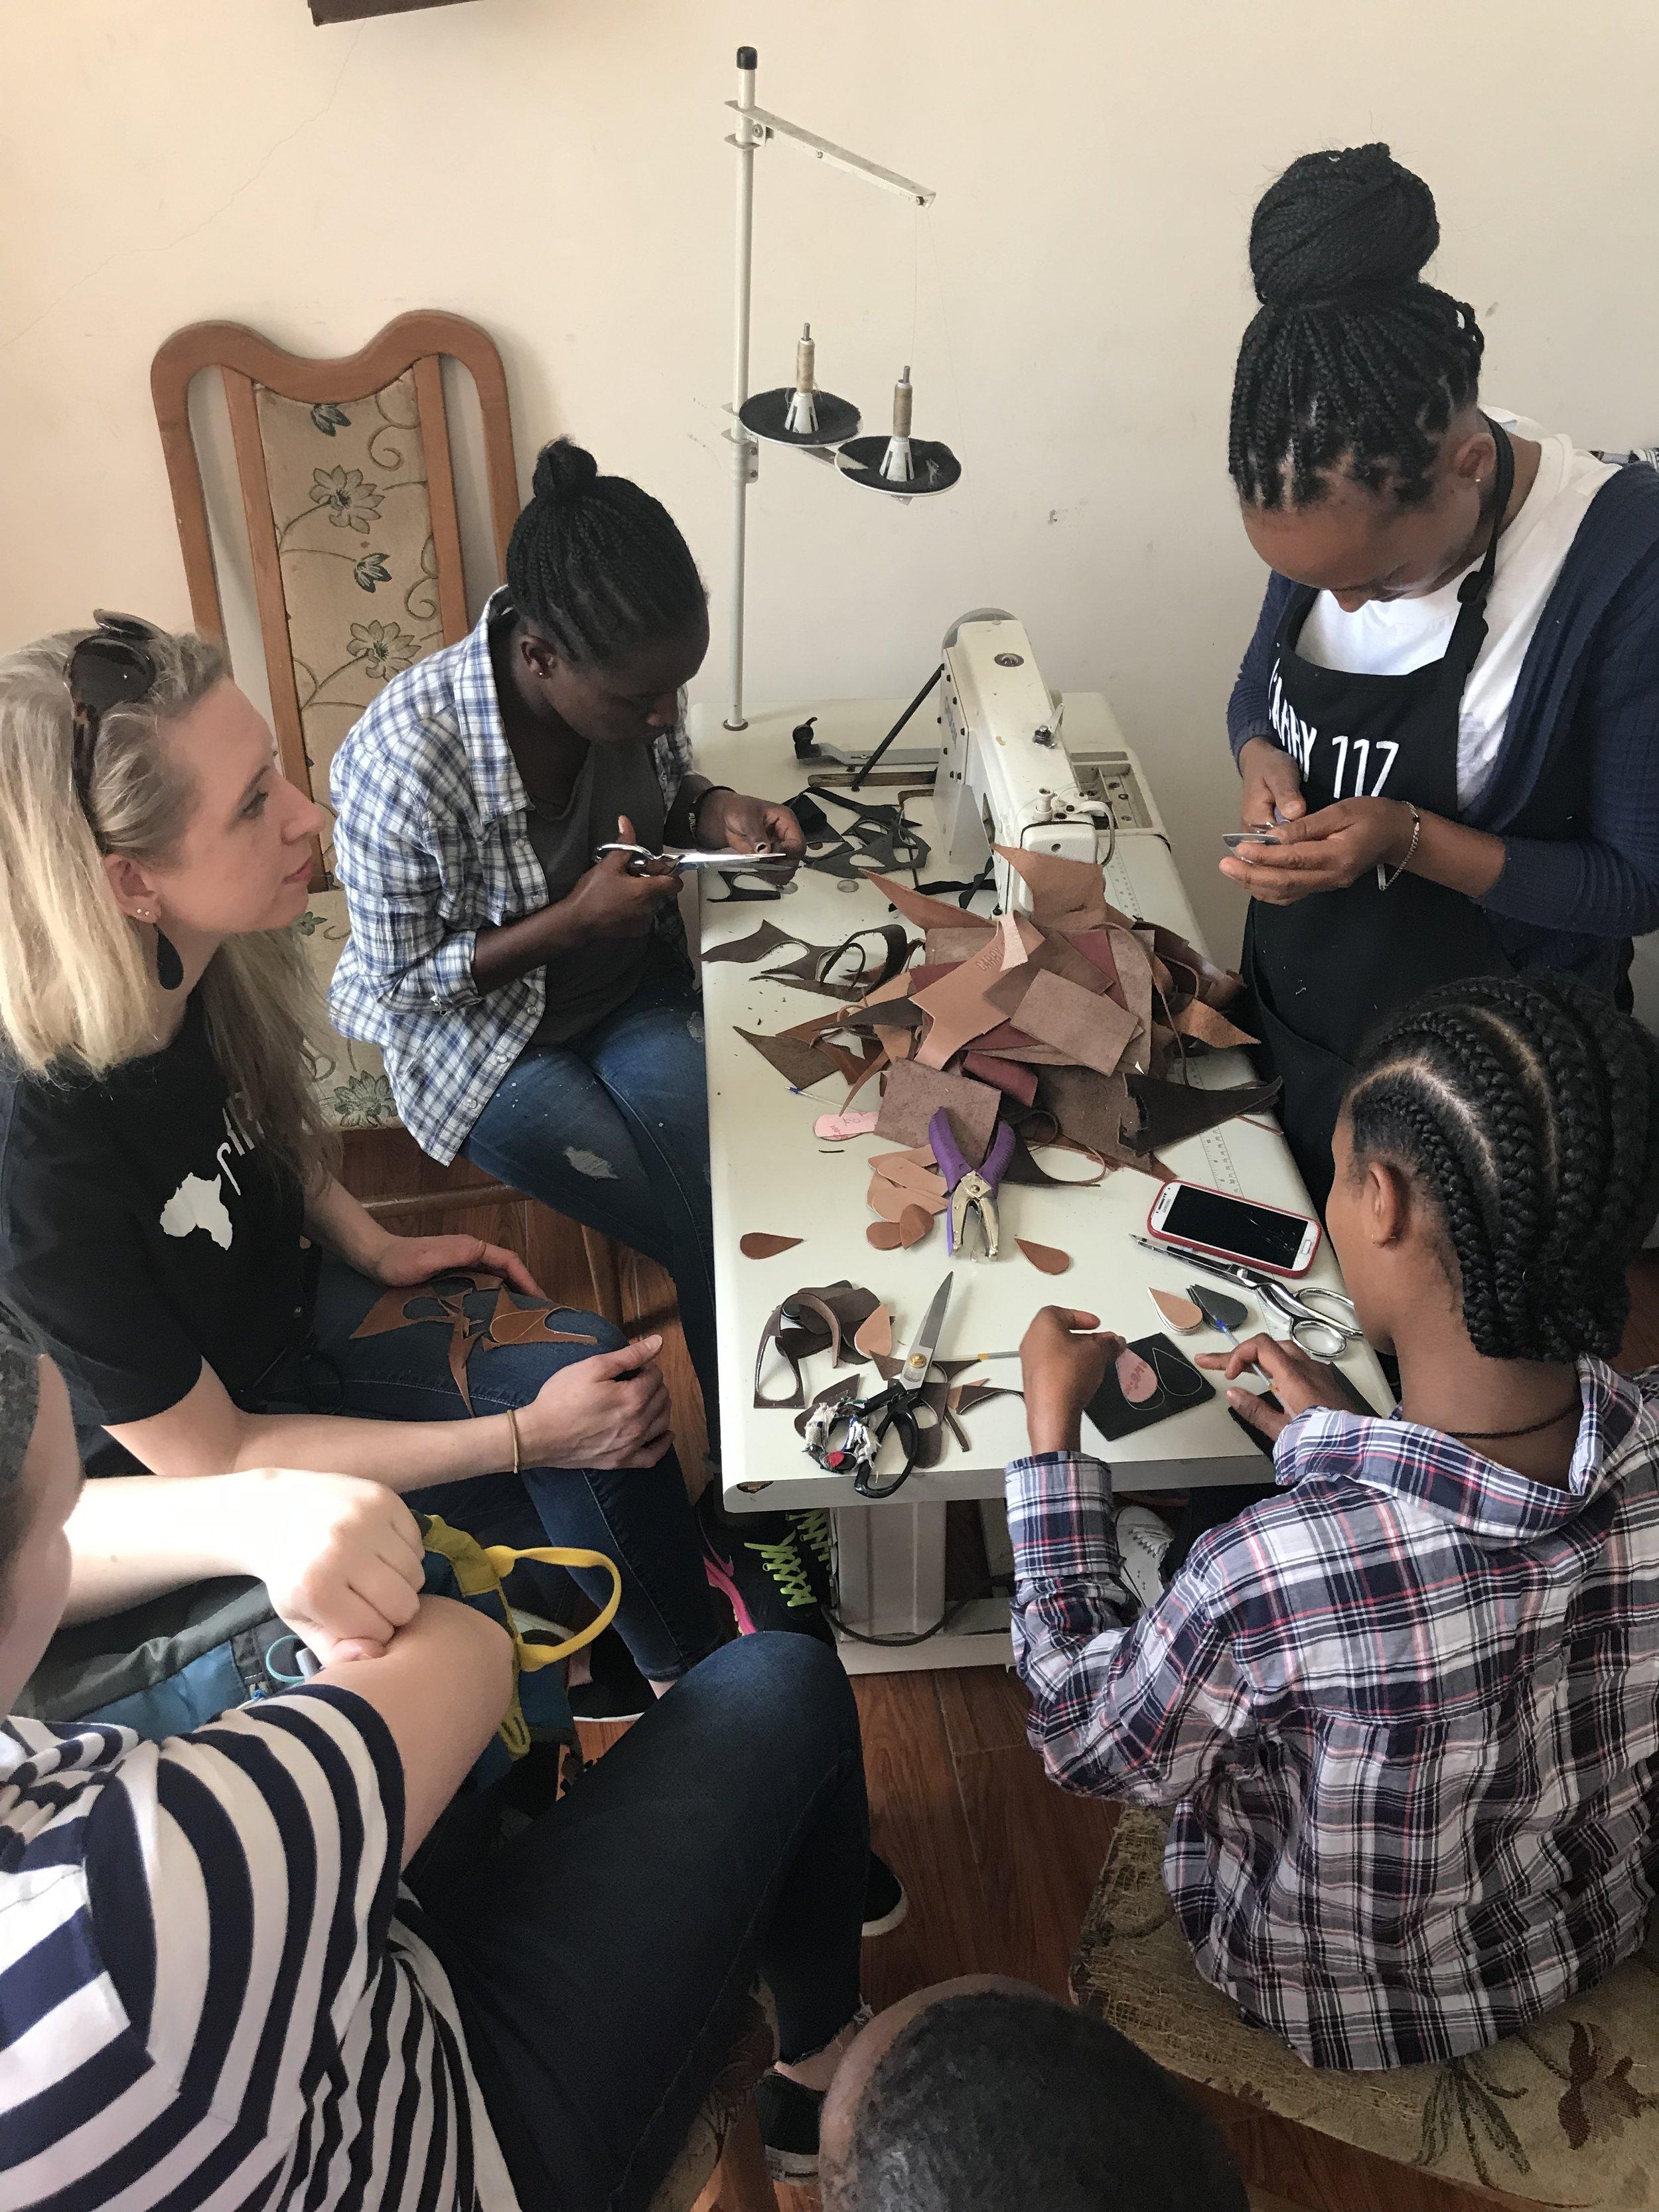 Teen girls making earrings_ Photo Mar 09, 2 46 01 AM.jpg